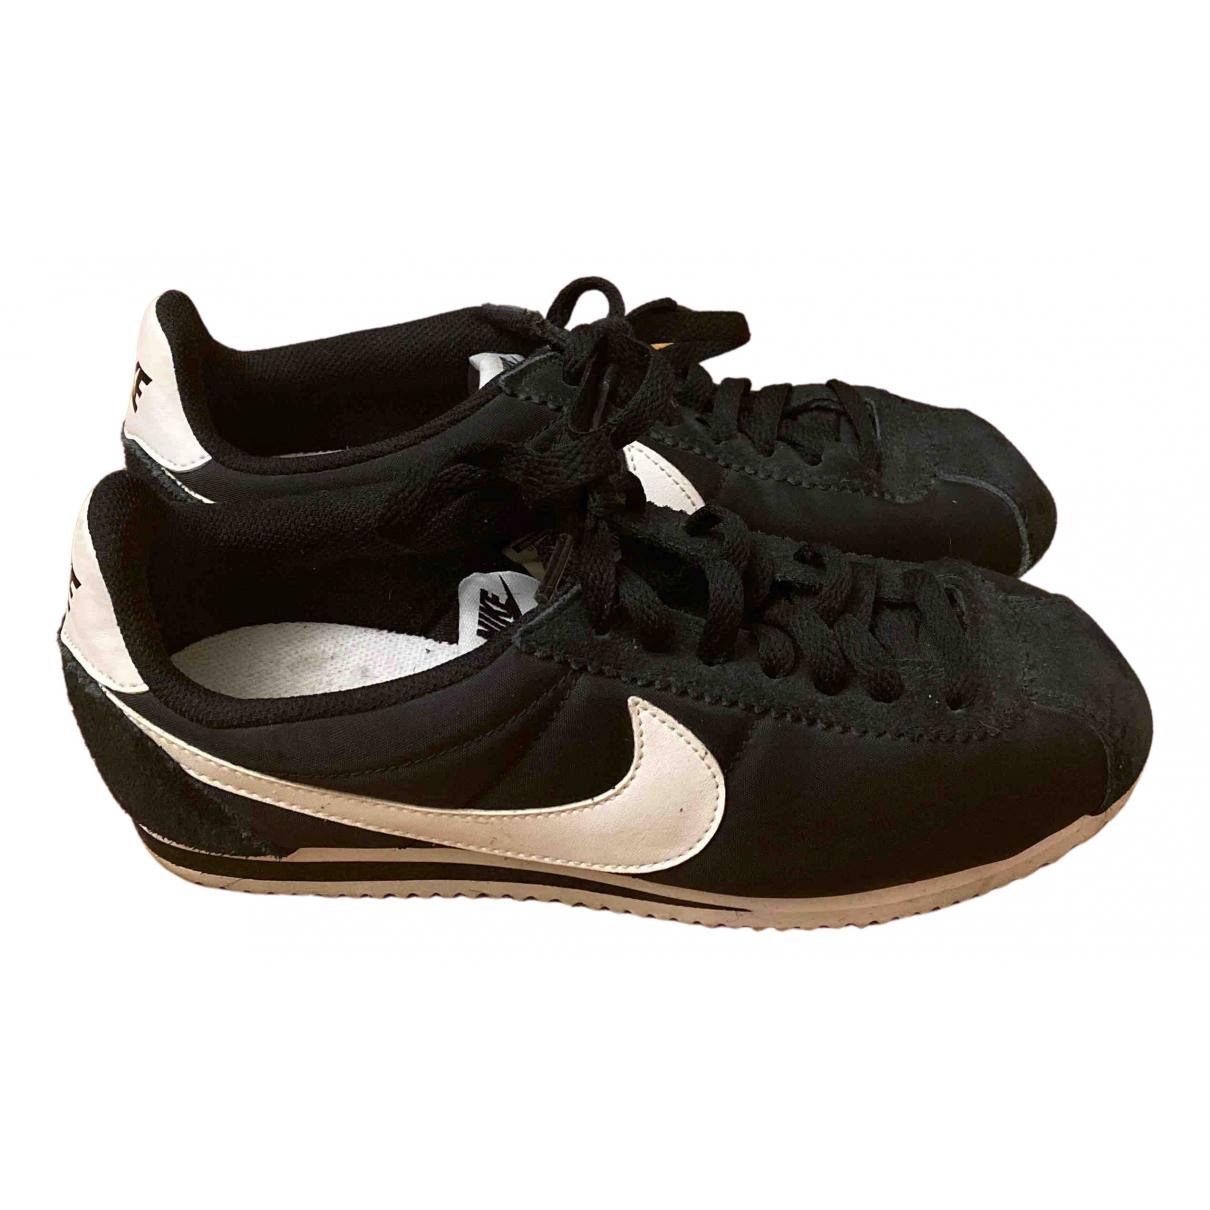 Nike Cortez Black Cloth Trainers for Women 38.5 EU